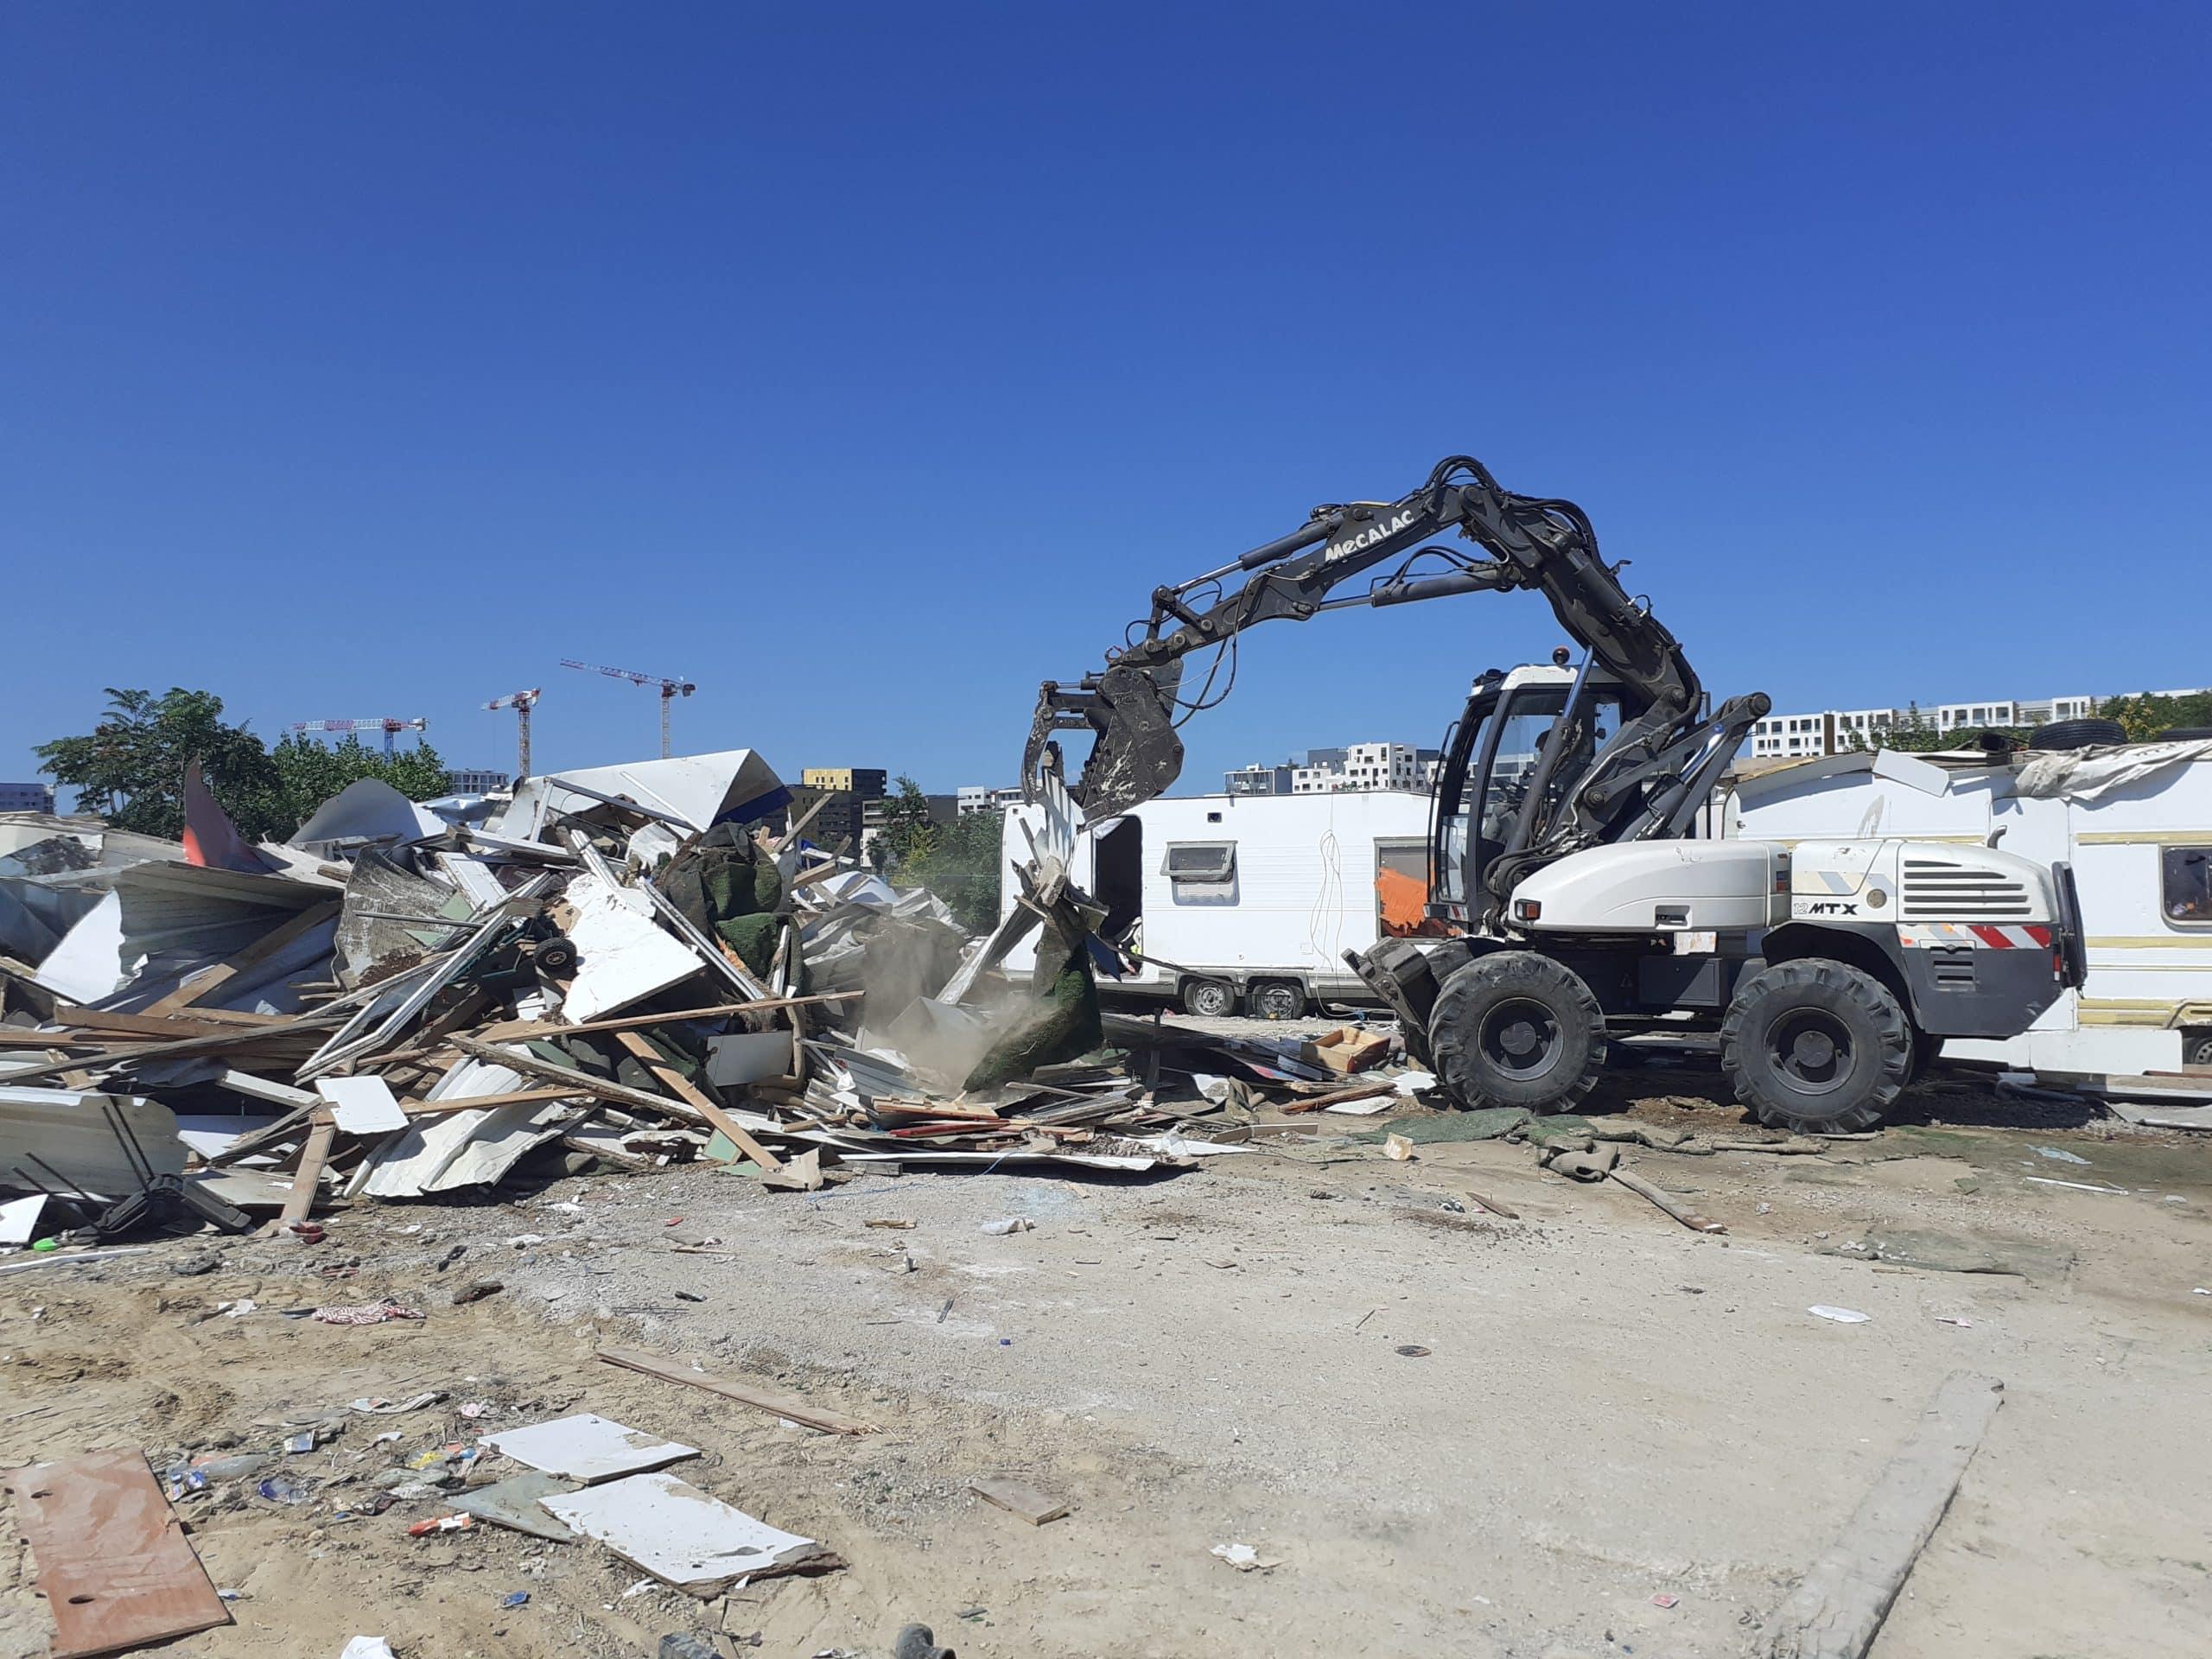 Montpellier évacuation bidonvilles